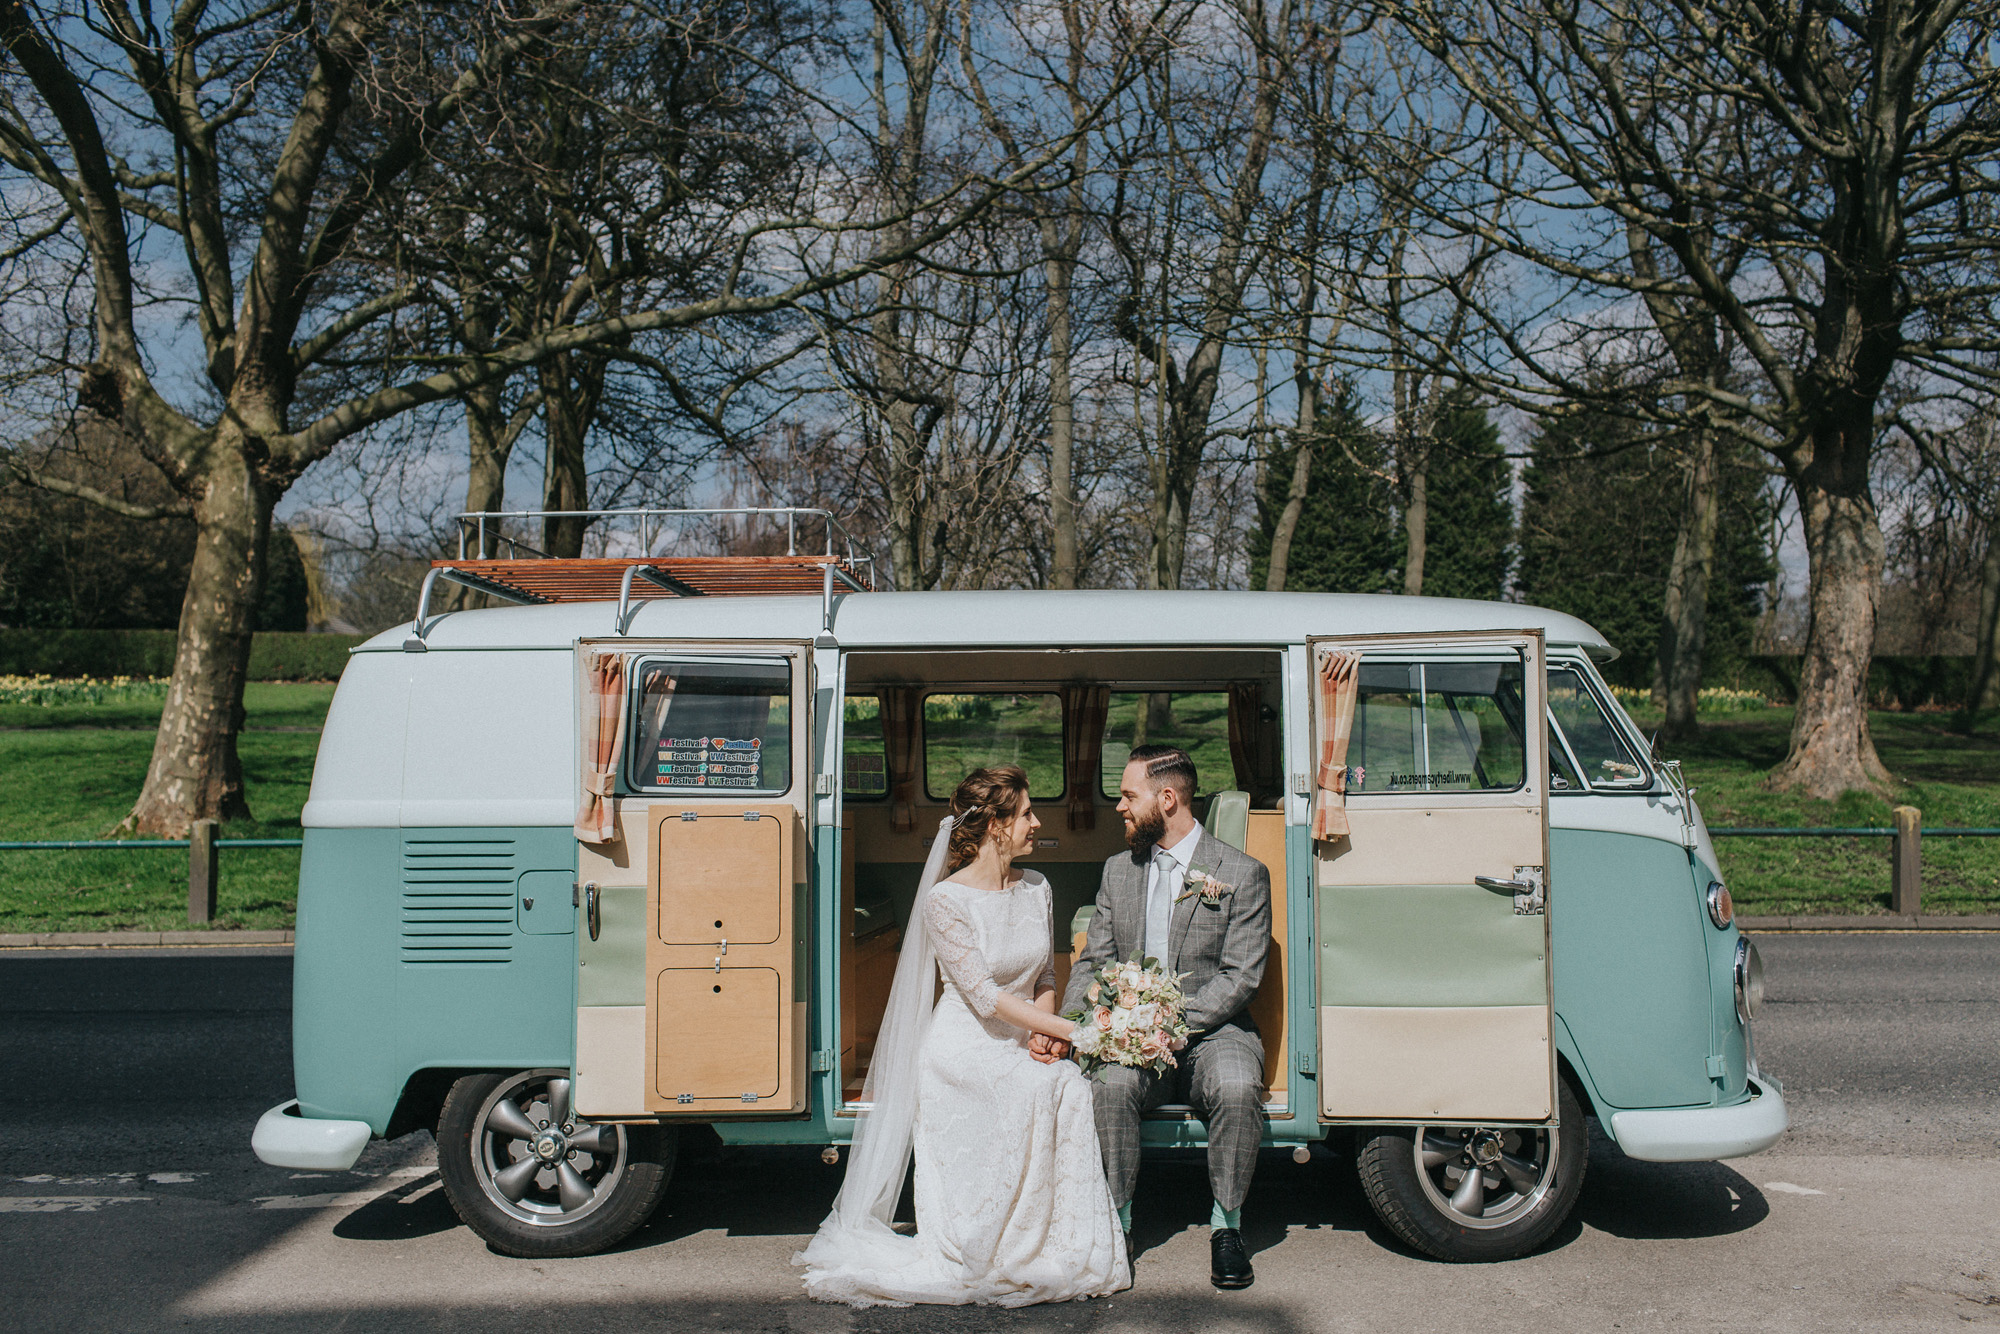 Kate-Beaumont-Lace-Flared-Dahlia-Gown-Leeds-Wedding-Bloom-Weddings-43.jpg